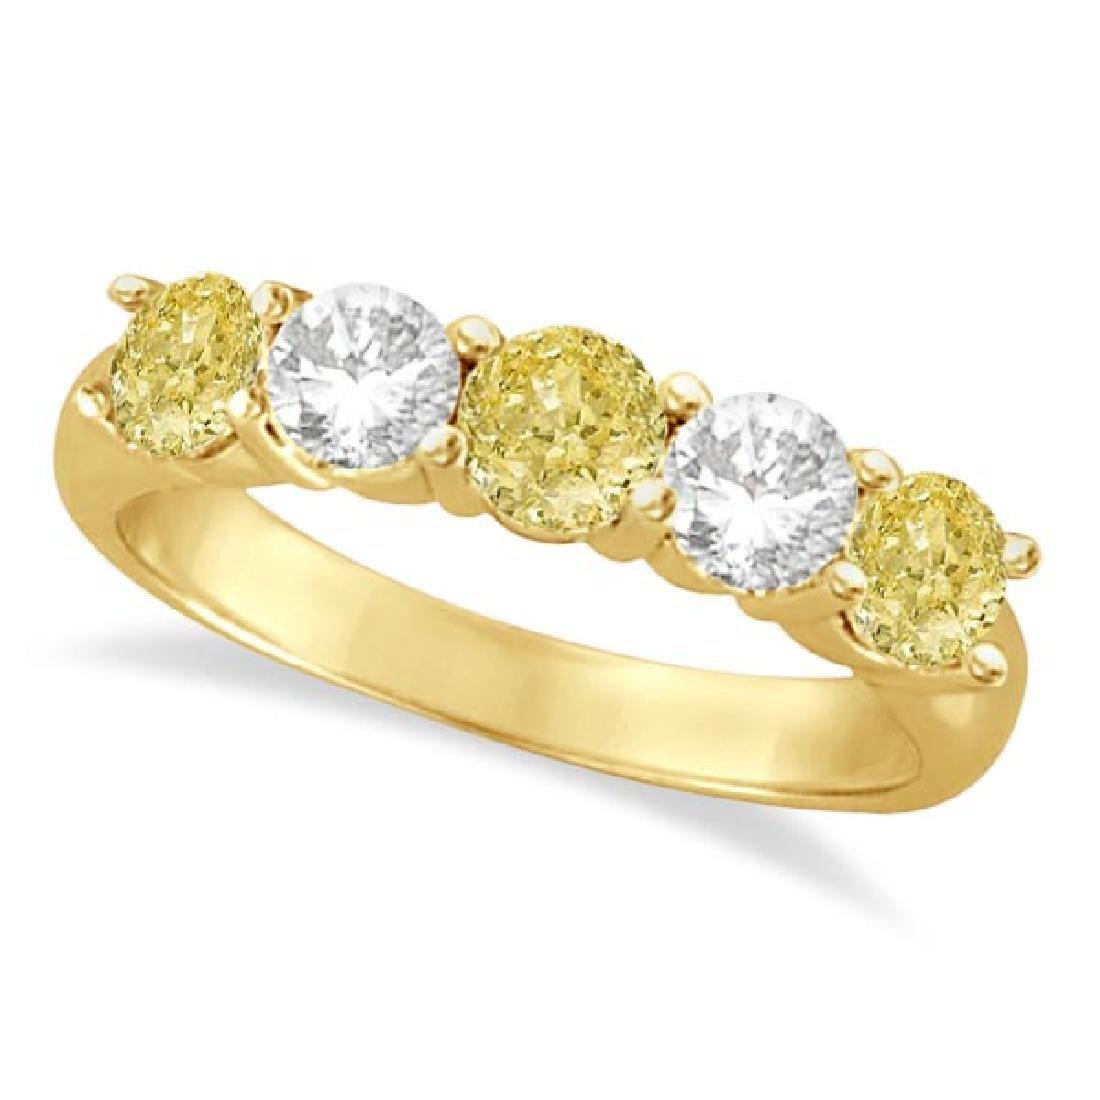 Five Stone White and Fancy Yellow Diamond Ring 14k Yell